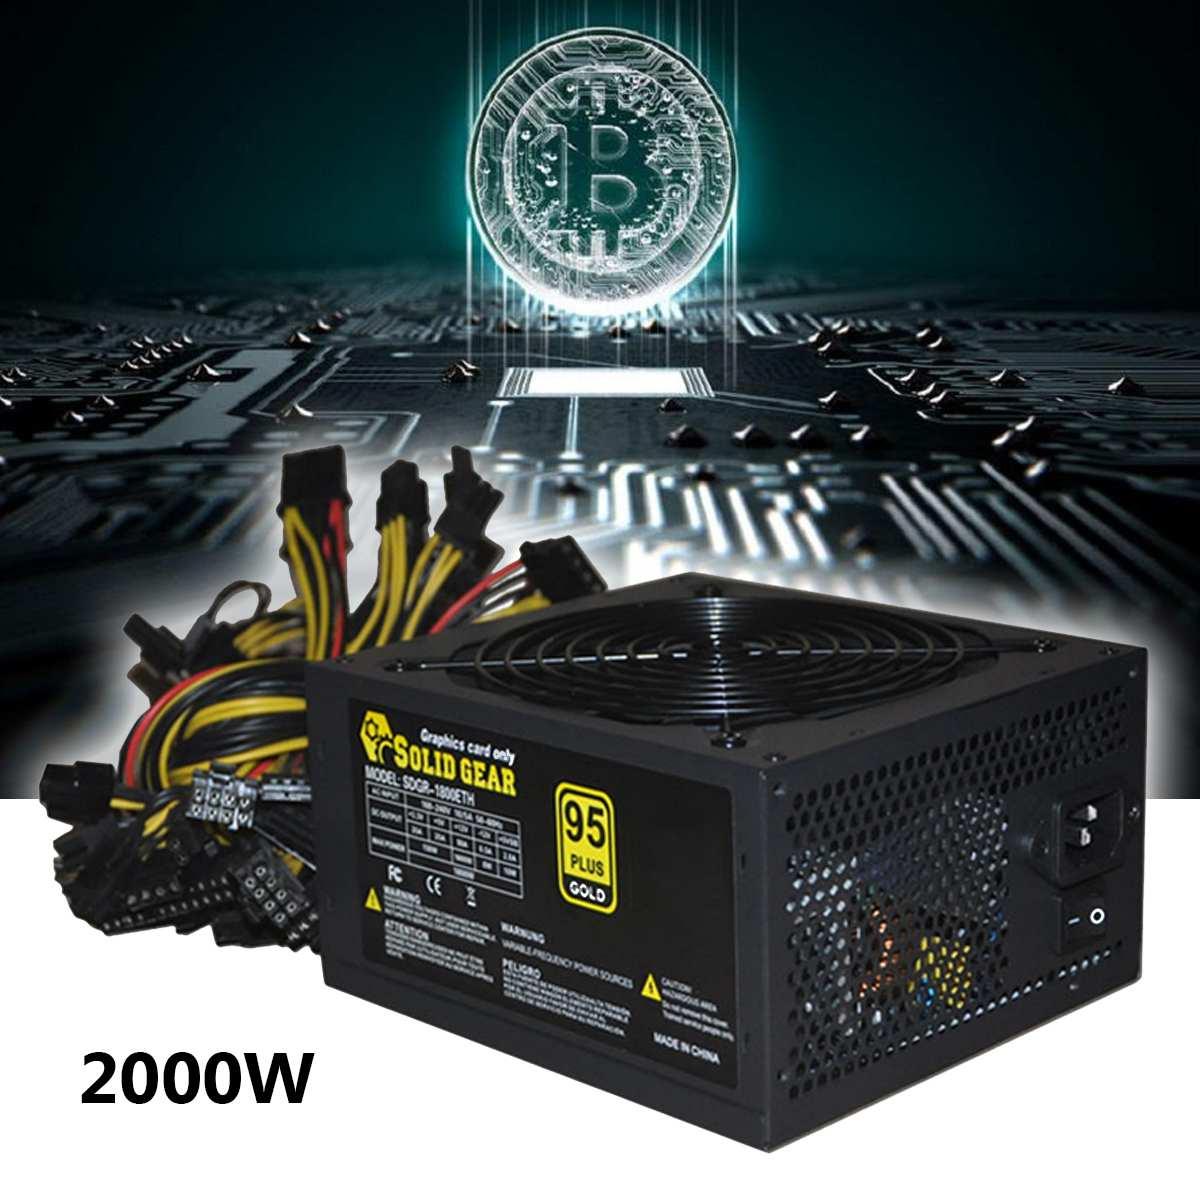 2000 Вт Плюс золото питание ETH Майнинг Биткойн ATX SATA IDE Поддержка 8 GPU эфириума PC для компьютера Minner машины